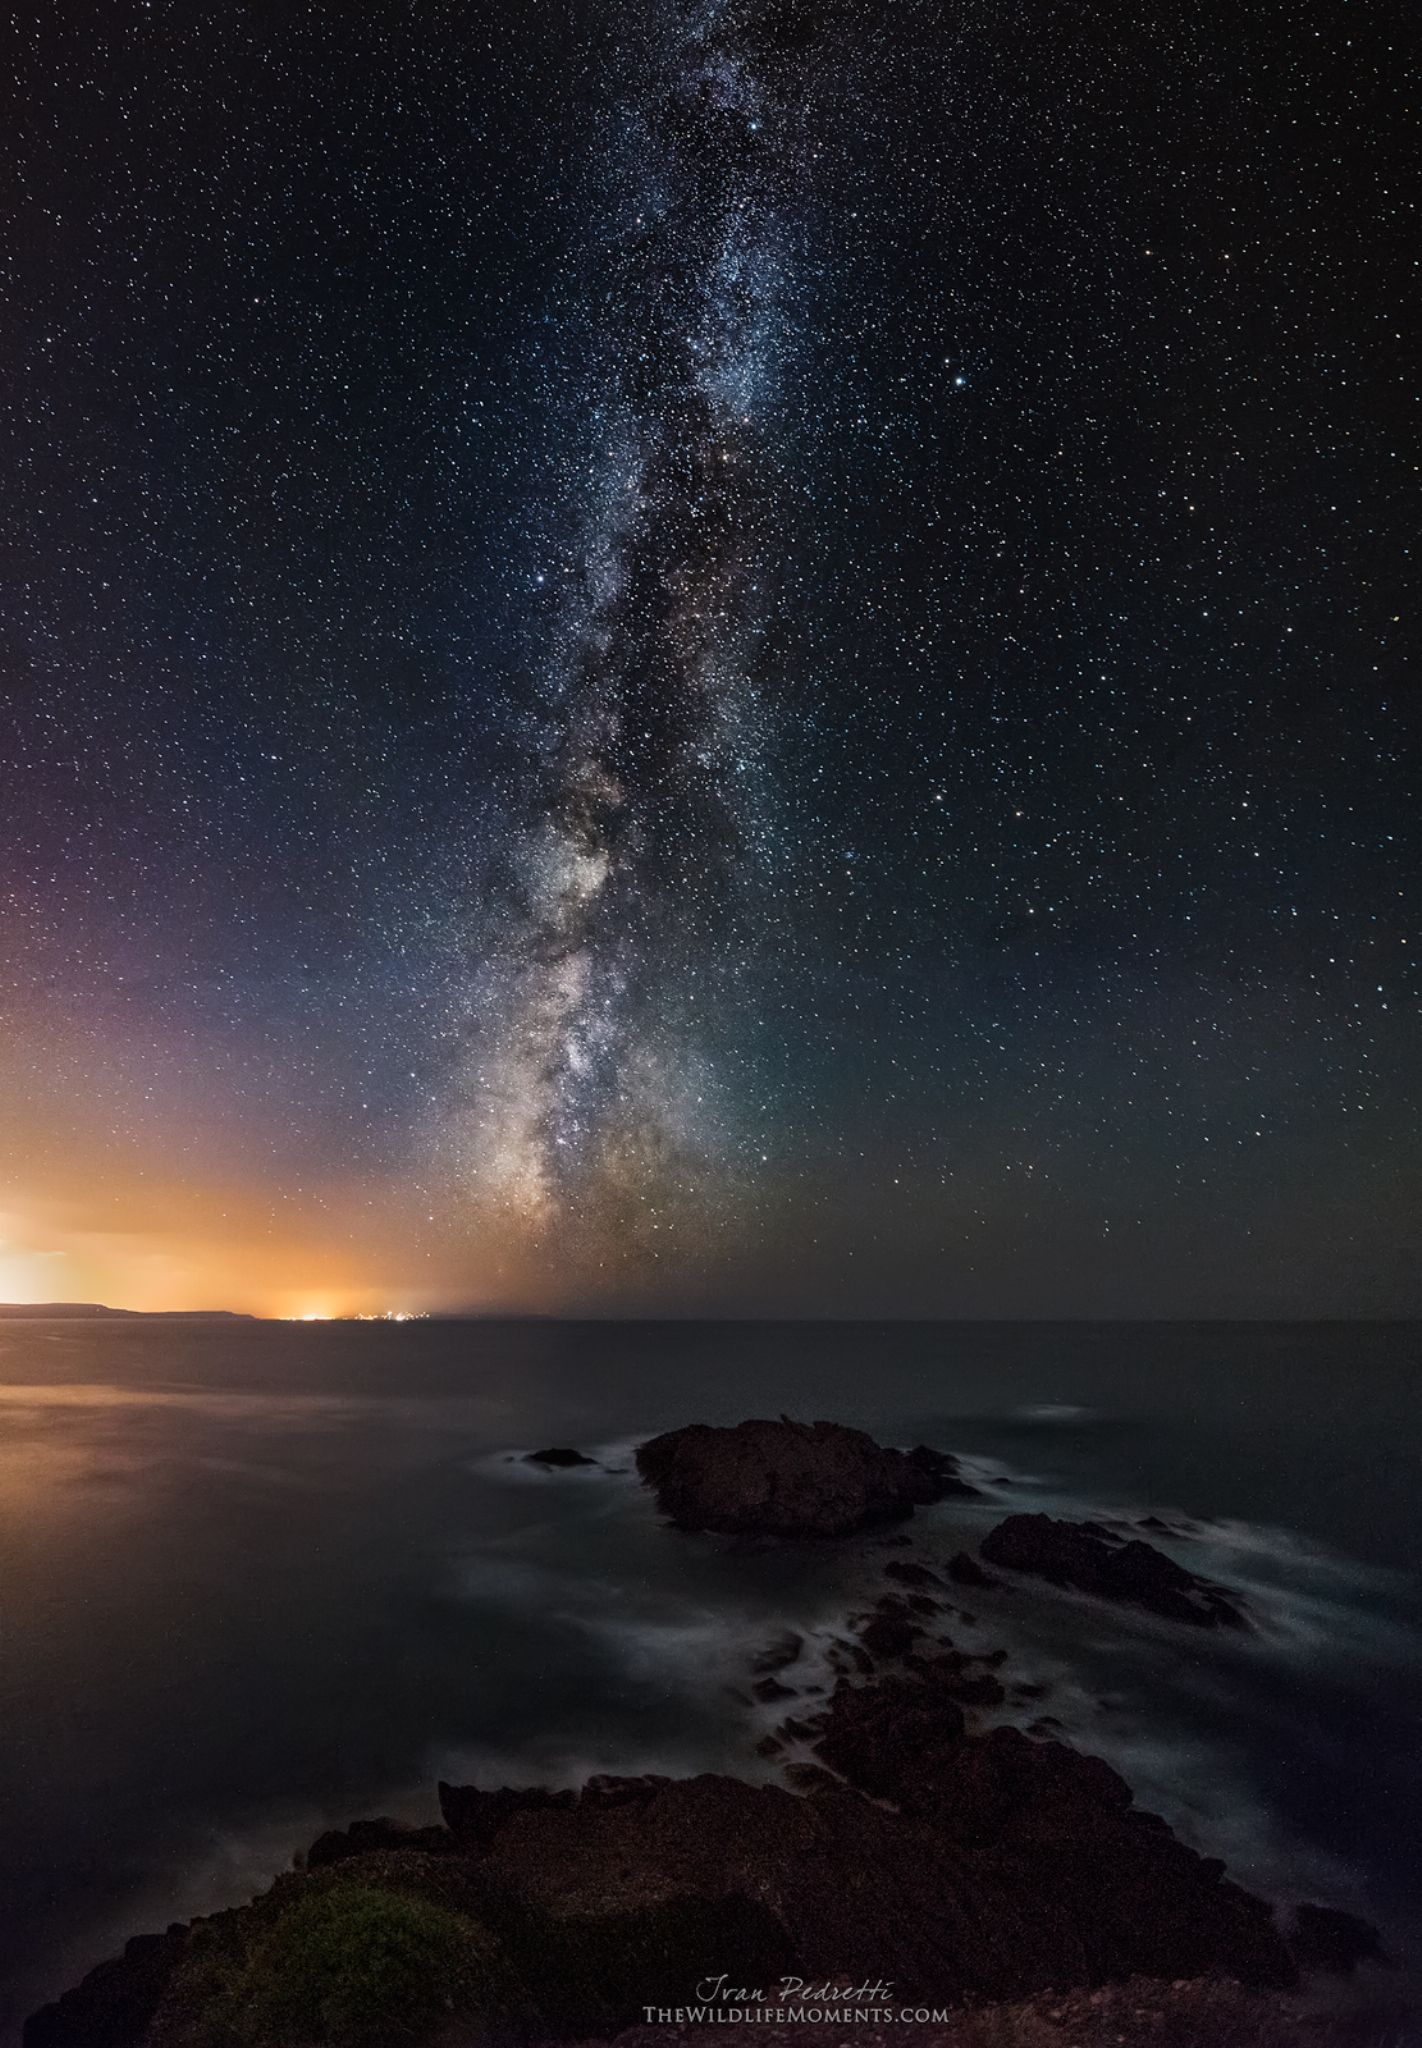 Starry bay by Ivan Pedretti